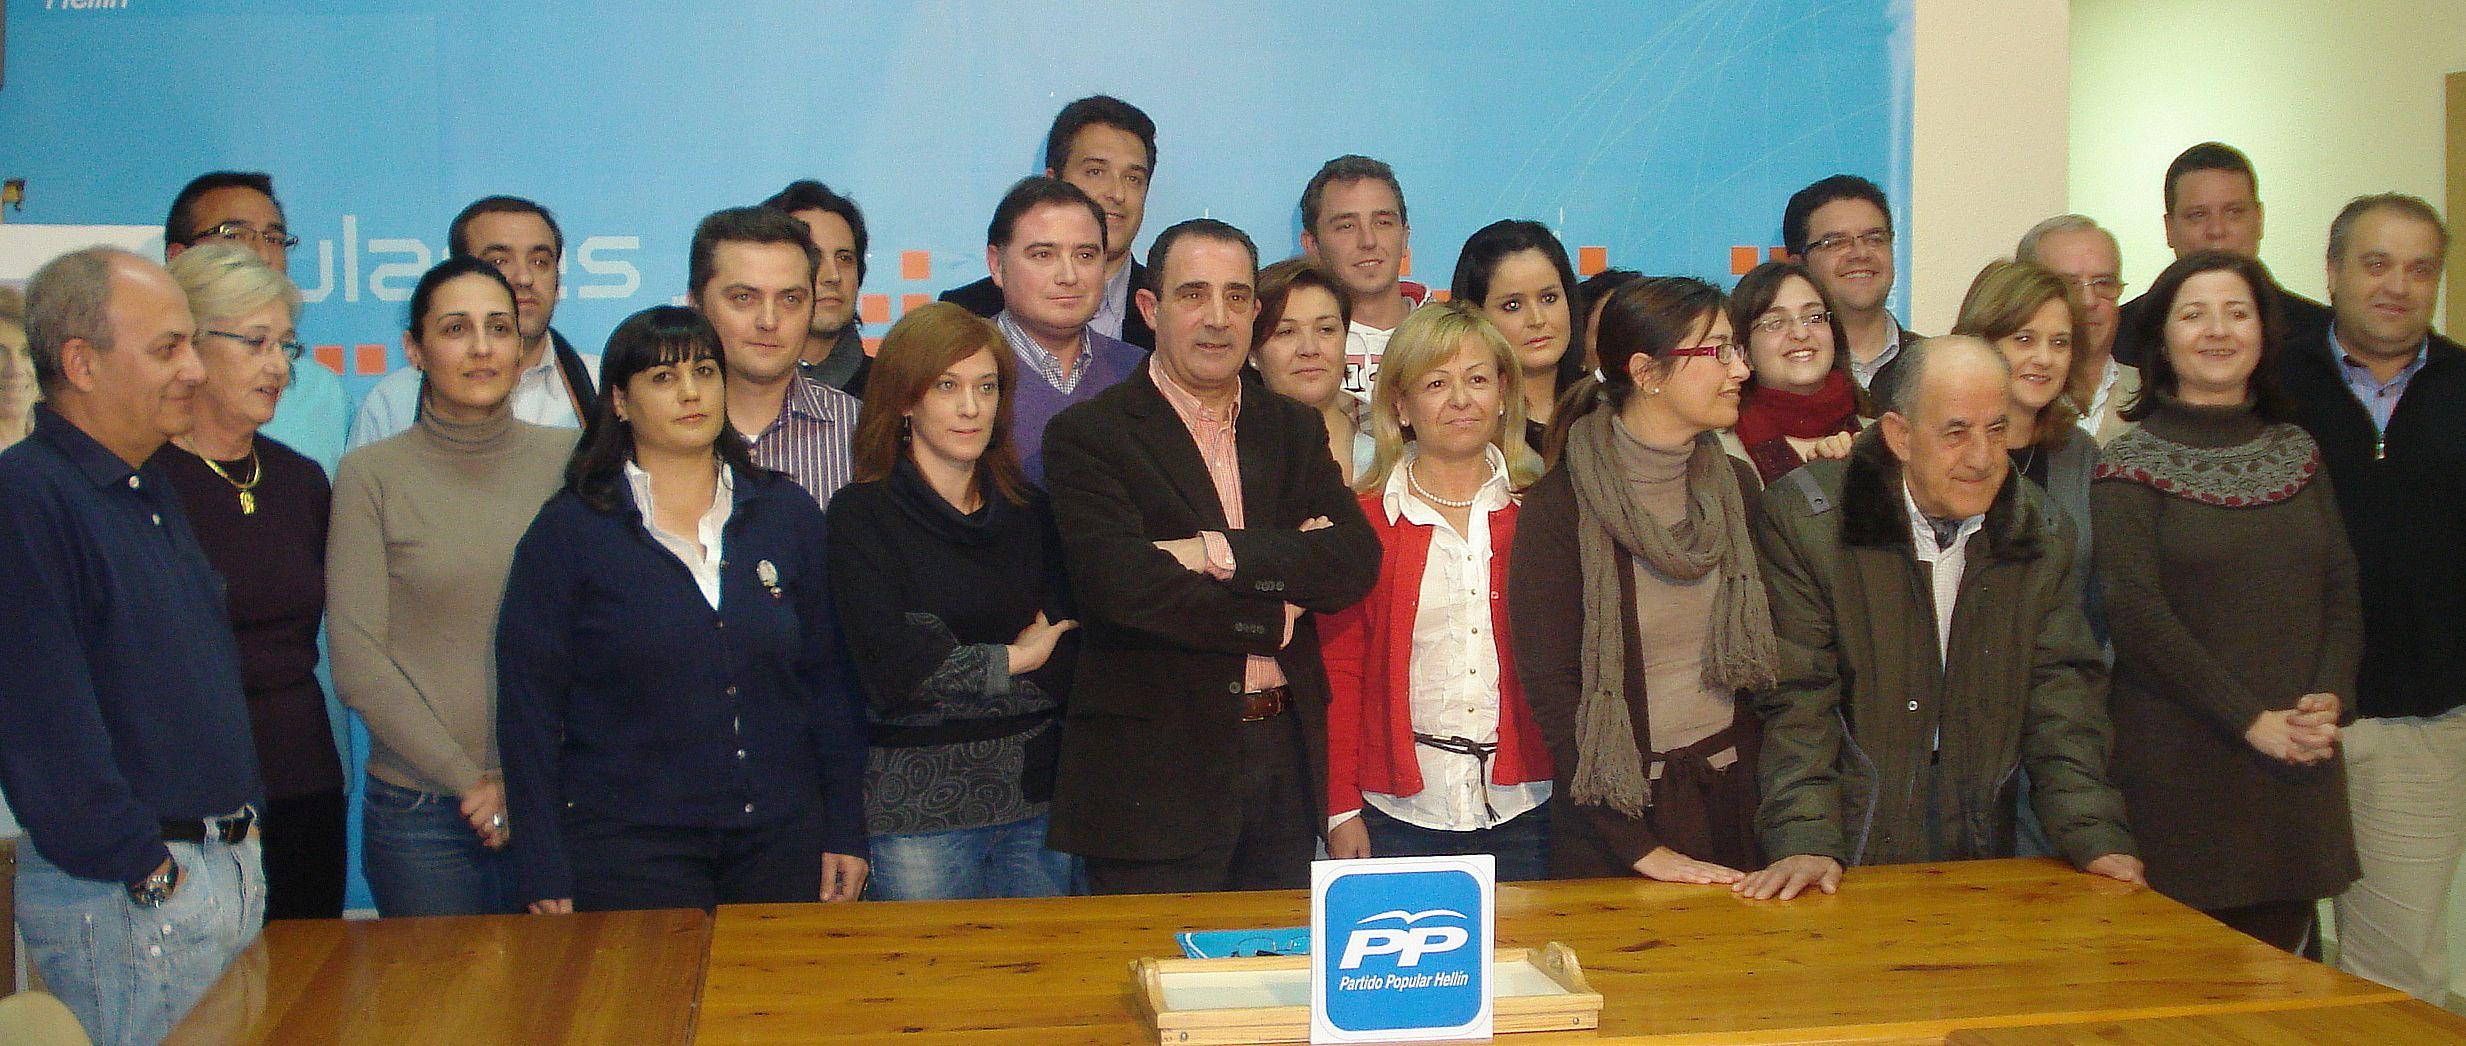 20110119_RP_PROPUESTA_CANDIDATO_01